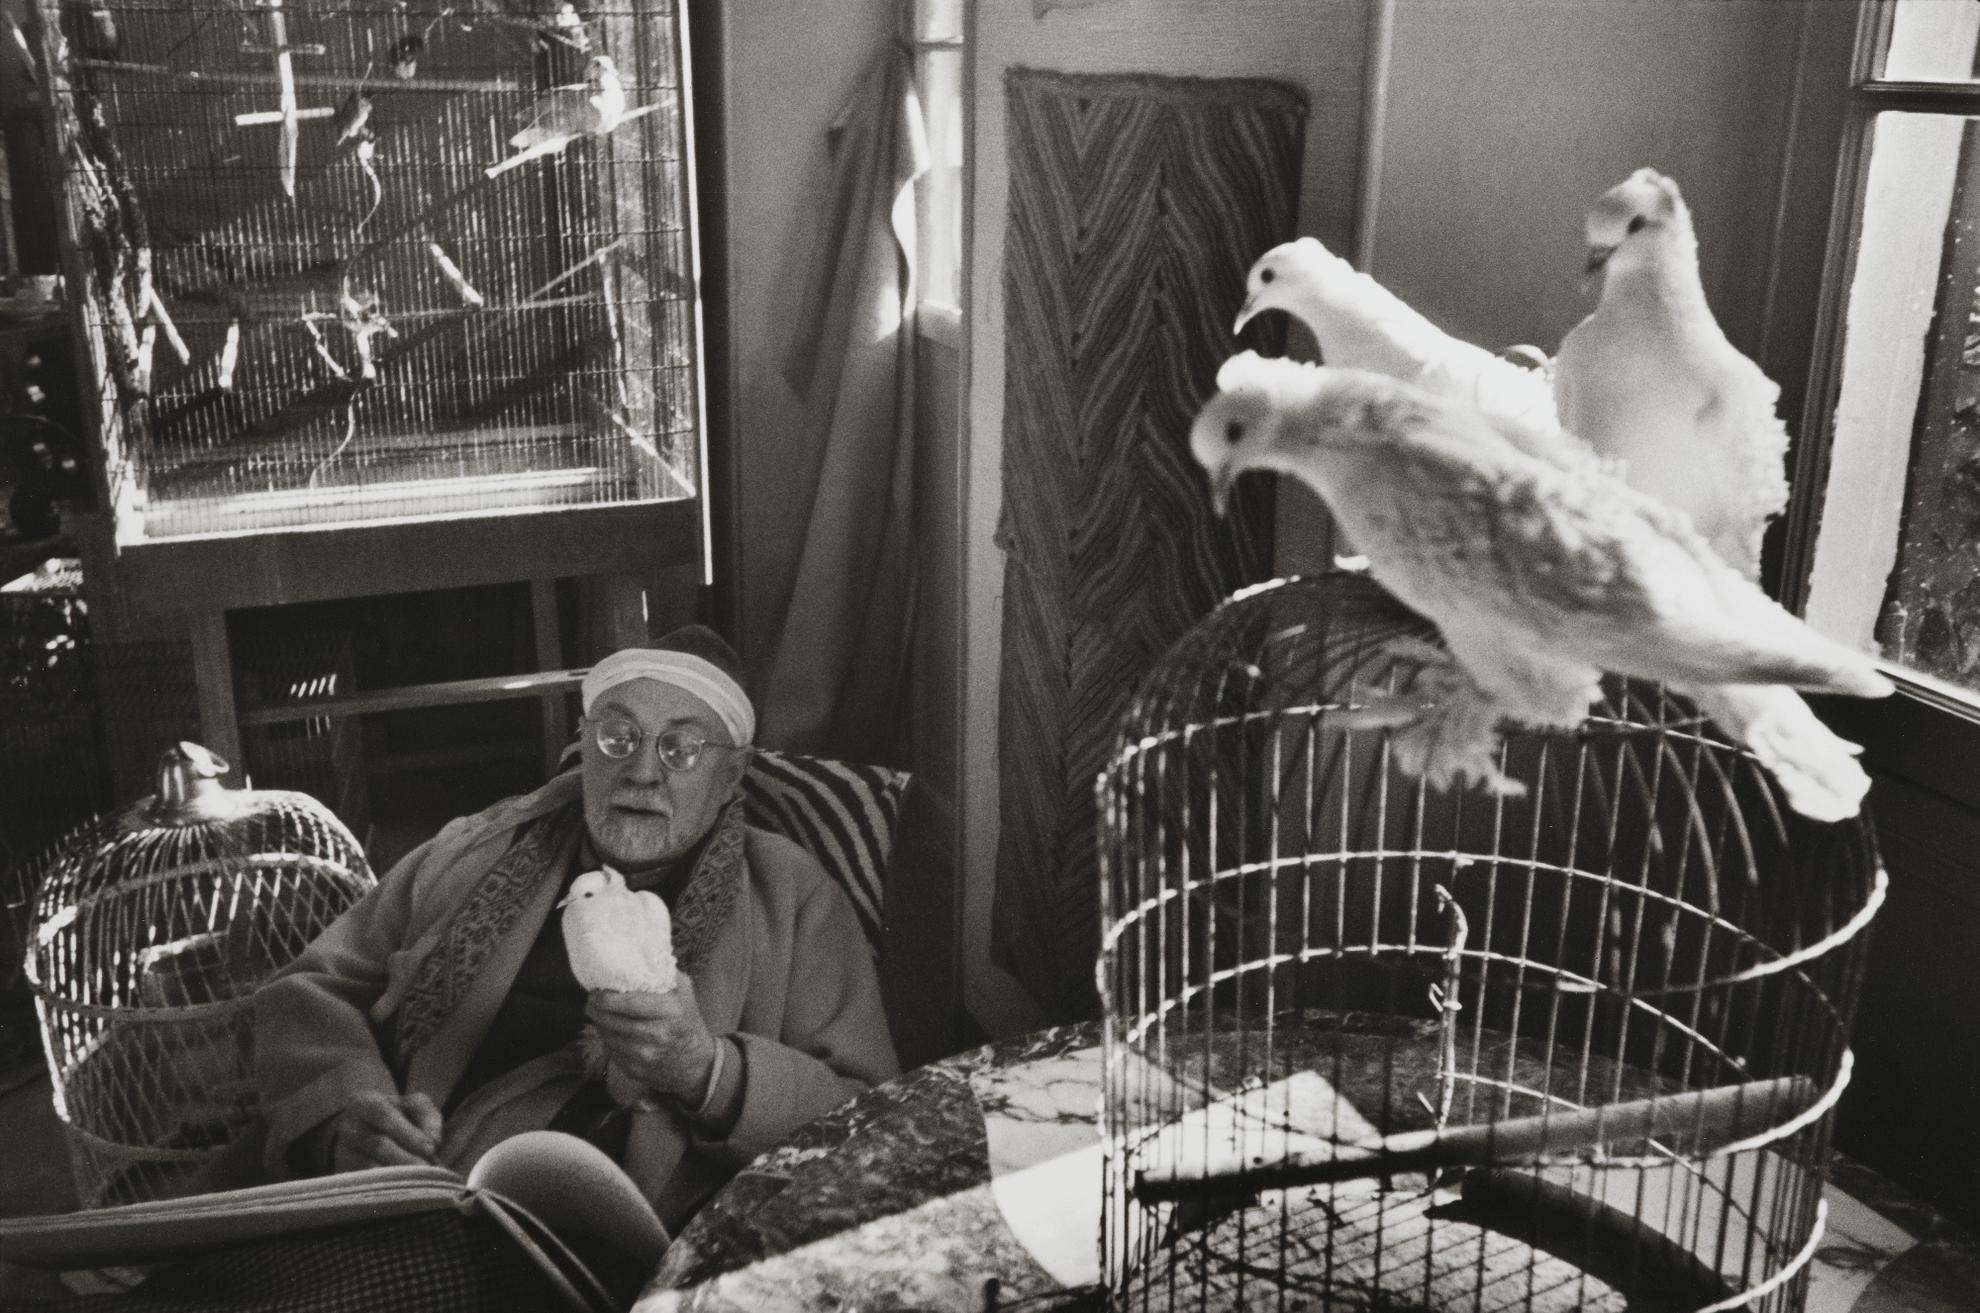 Henri Cartier-Bresson-Henri Matisse, Villa 'Le Reve', Vence, February-1944